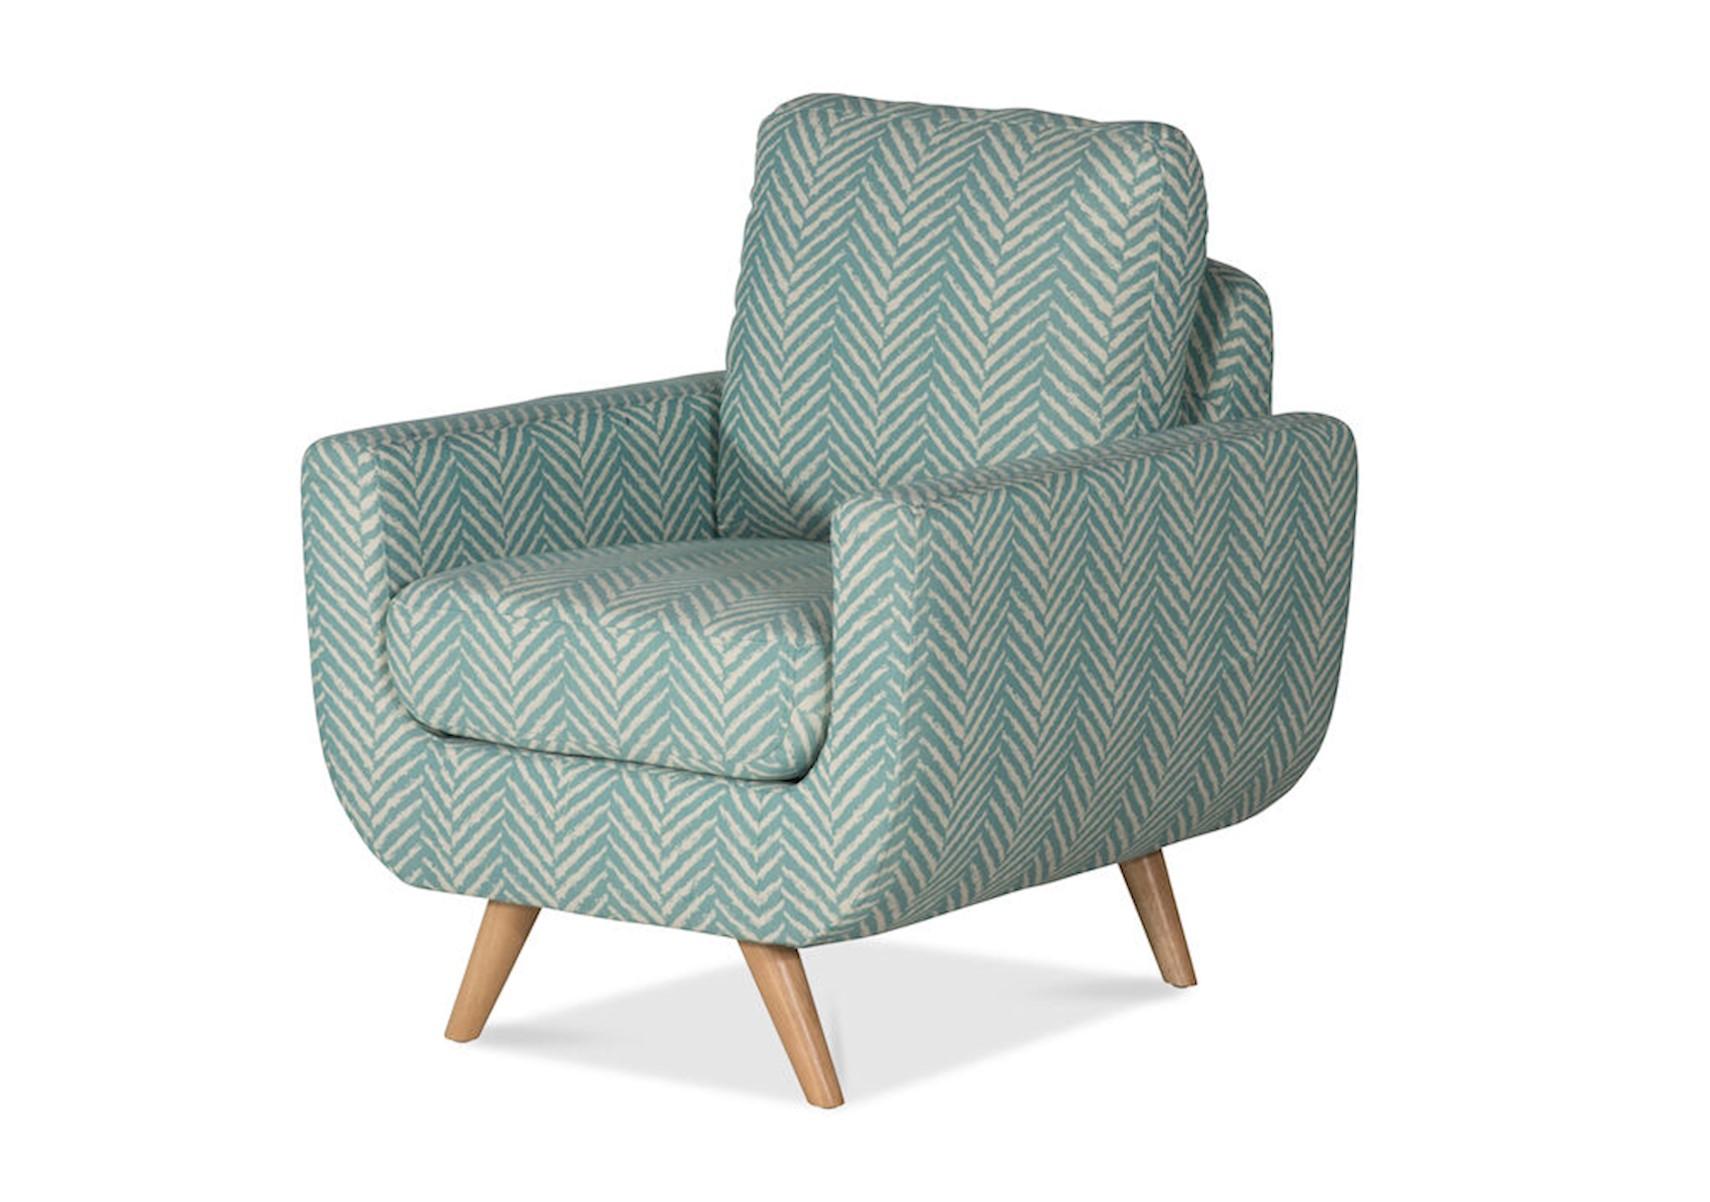 Fine Lacks Darrin Teal Accent Chair Lamtechconsult Wood Chair Design Ideas Lamtechconsultcom